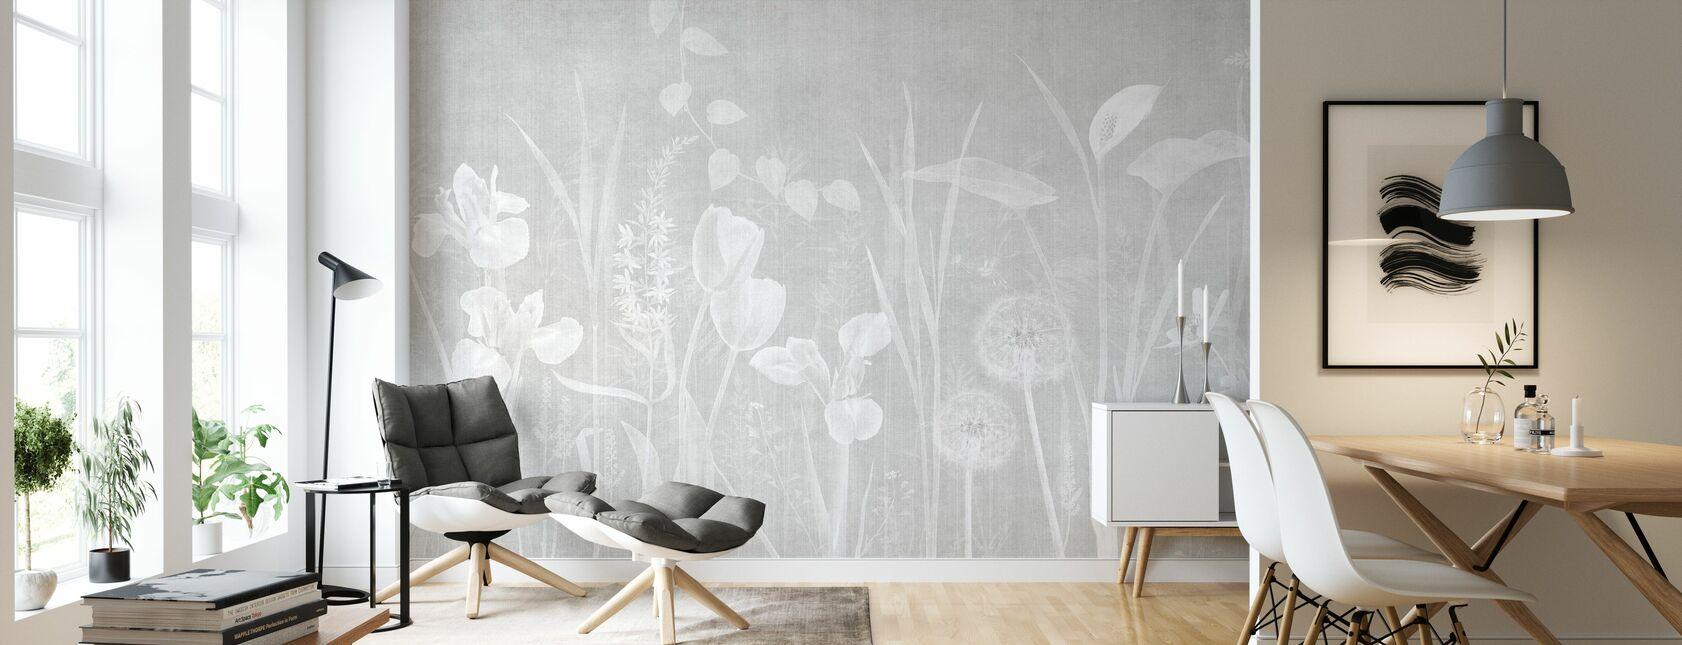 Dandelion Field - Ash Bright - Wallpaper - Living Room